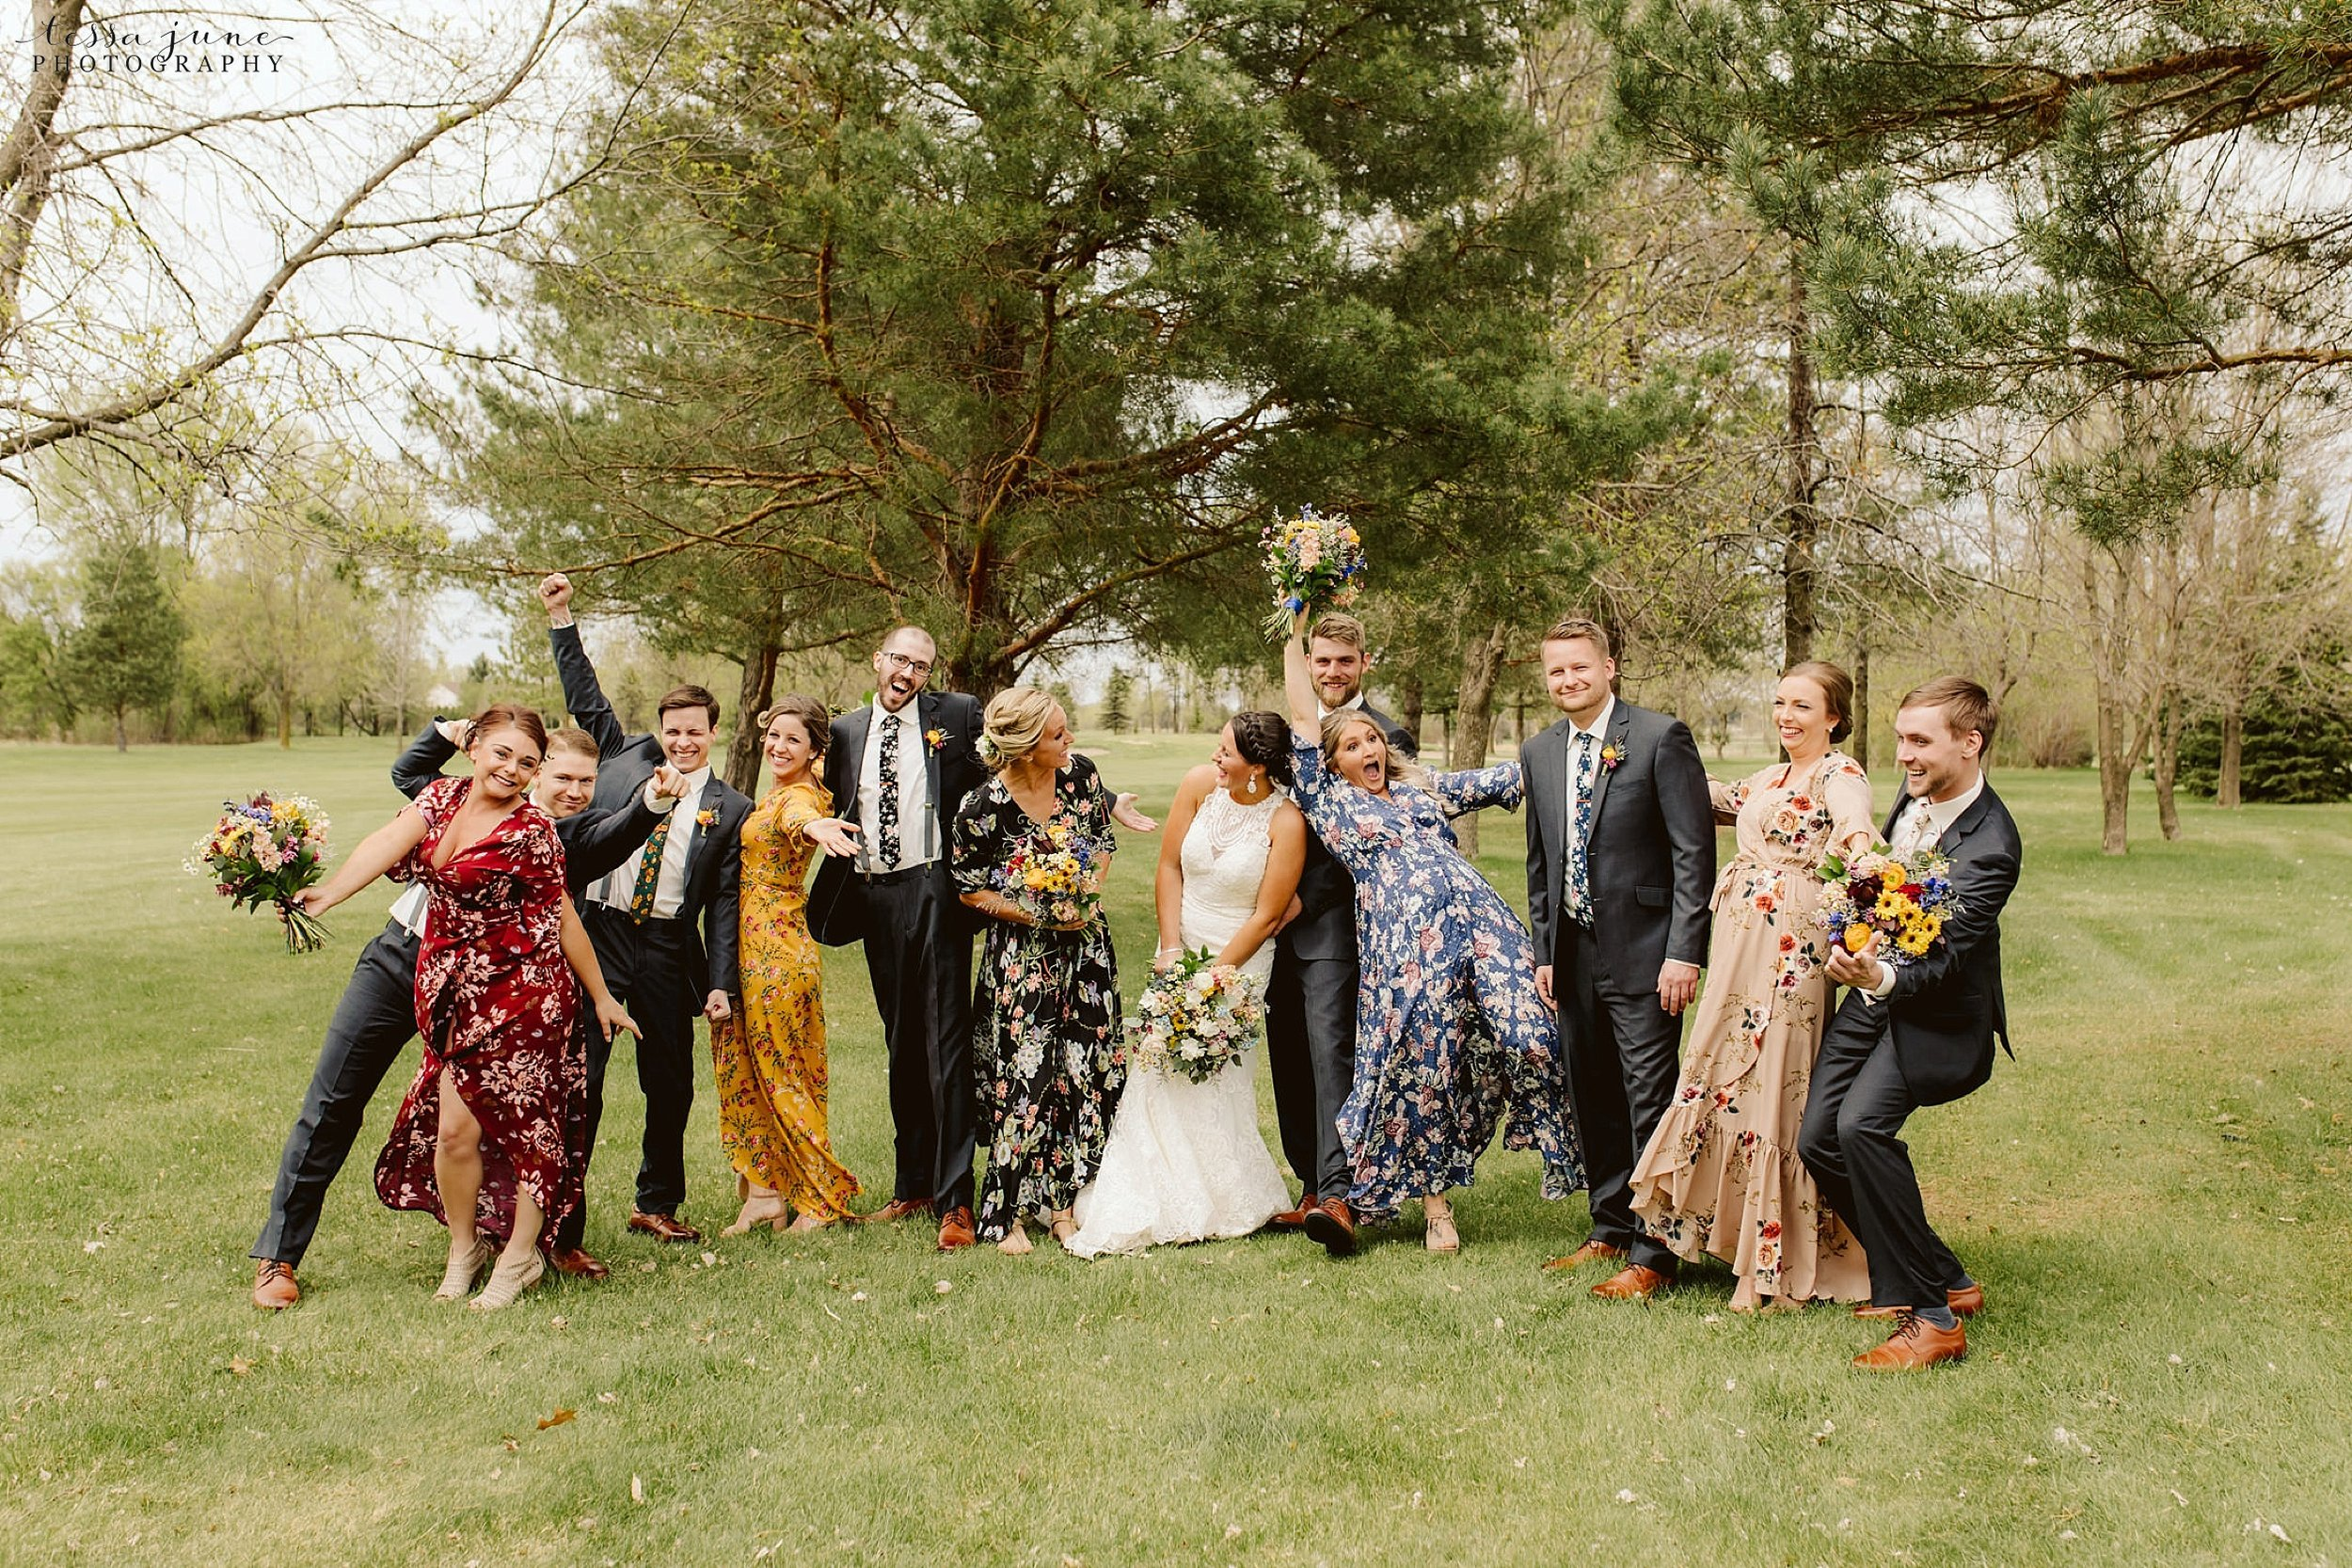 The-grands-at-mulligans-wedding-sartell-minnesota-spring-floral-spring-garden-wedding-71.jpg